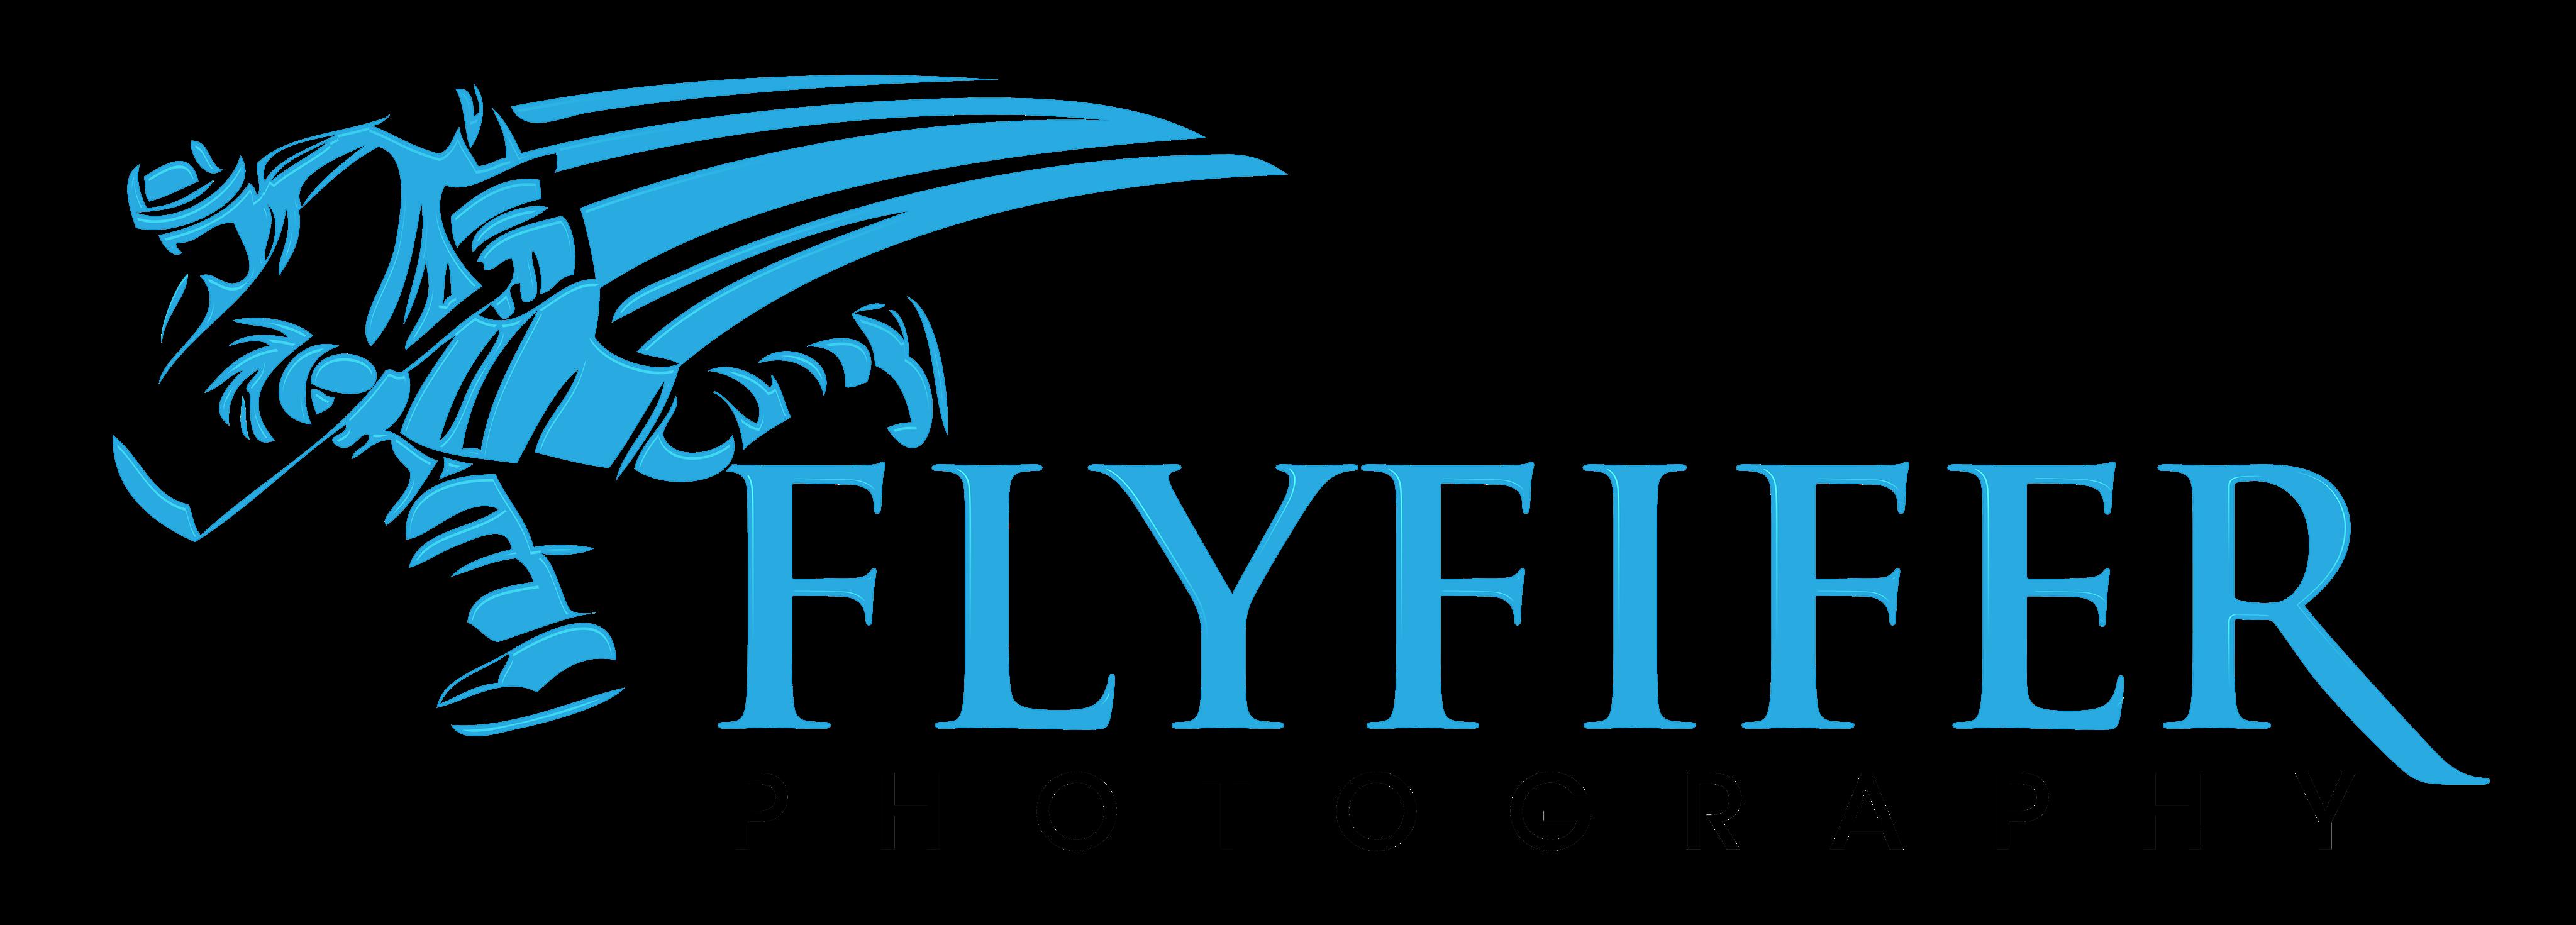 Flyfifer Photography